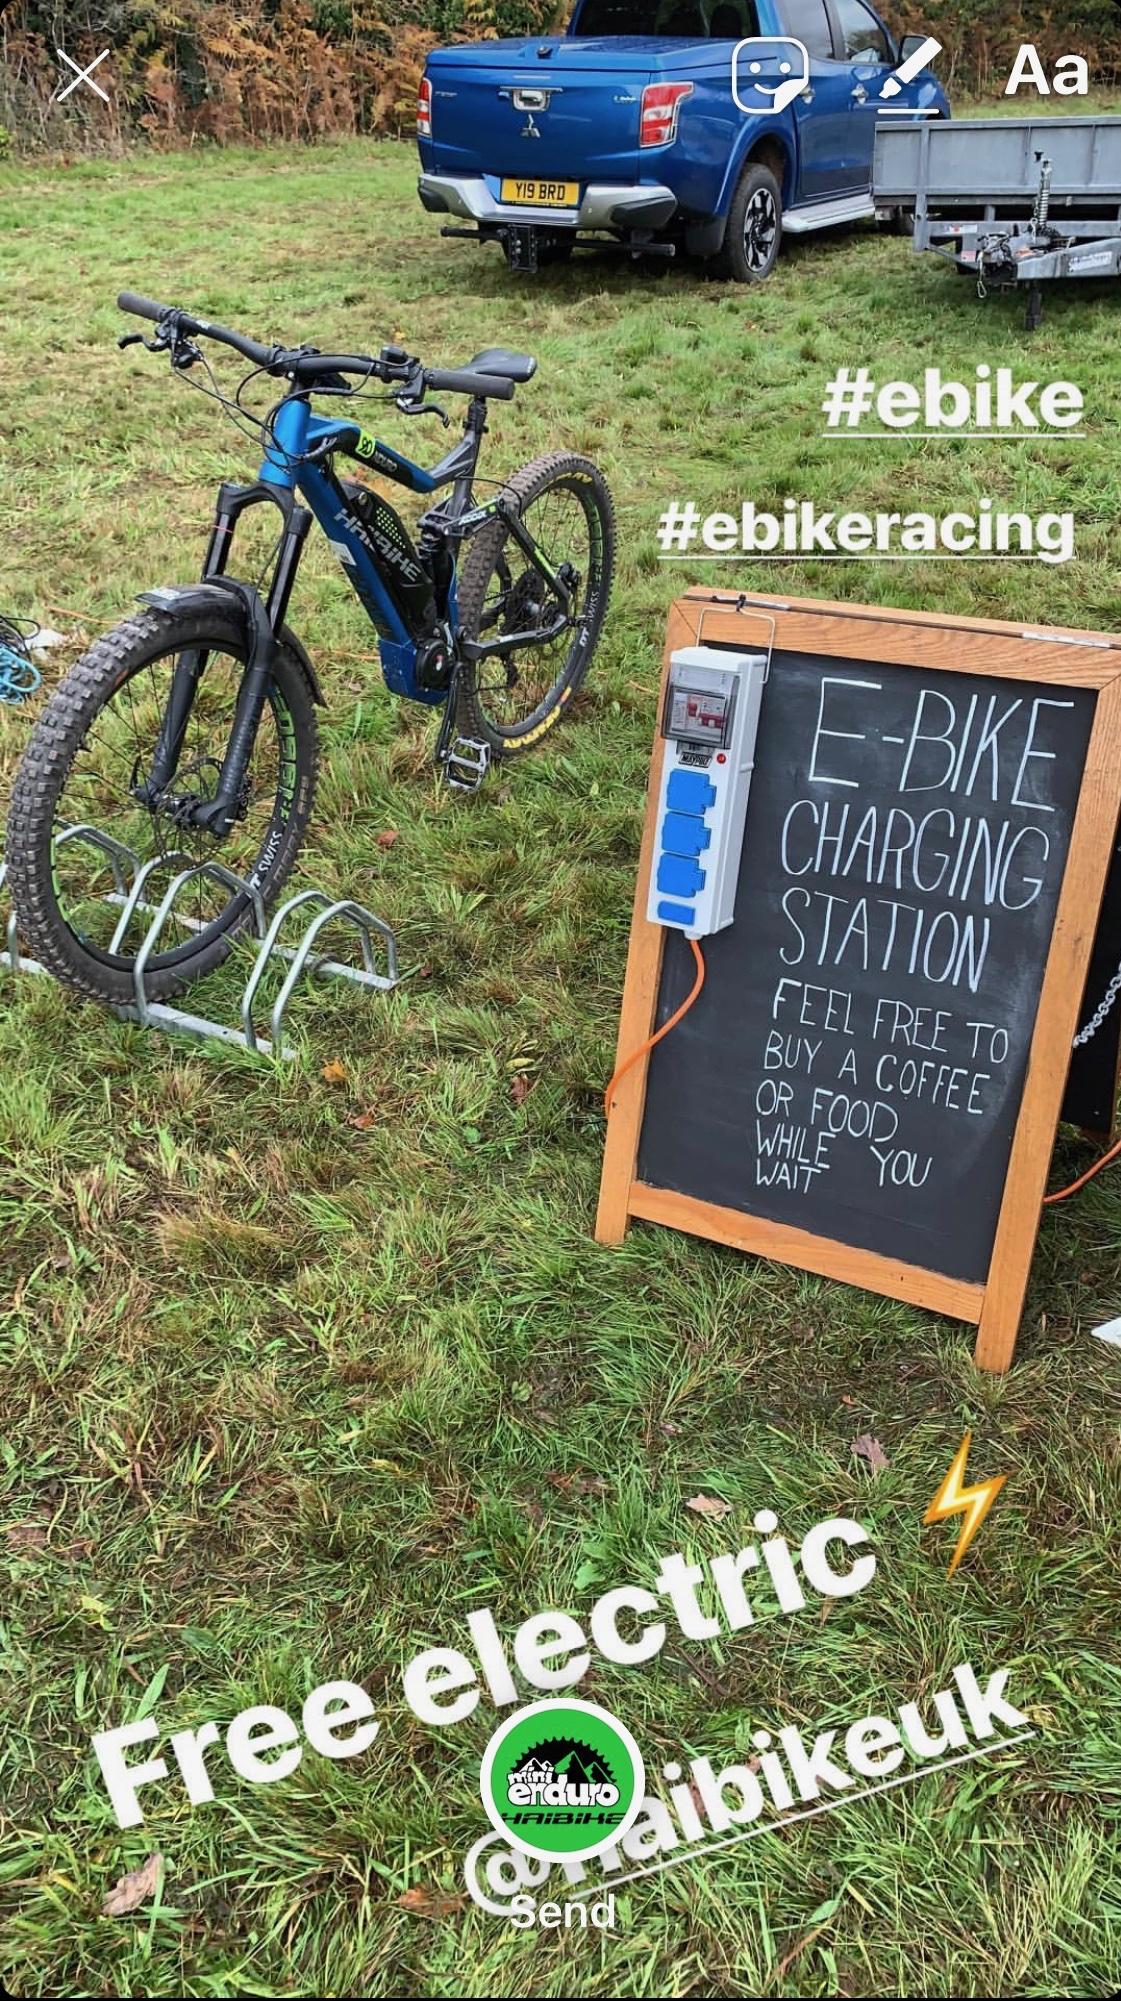 Free Fun E Bike charging station